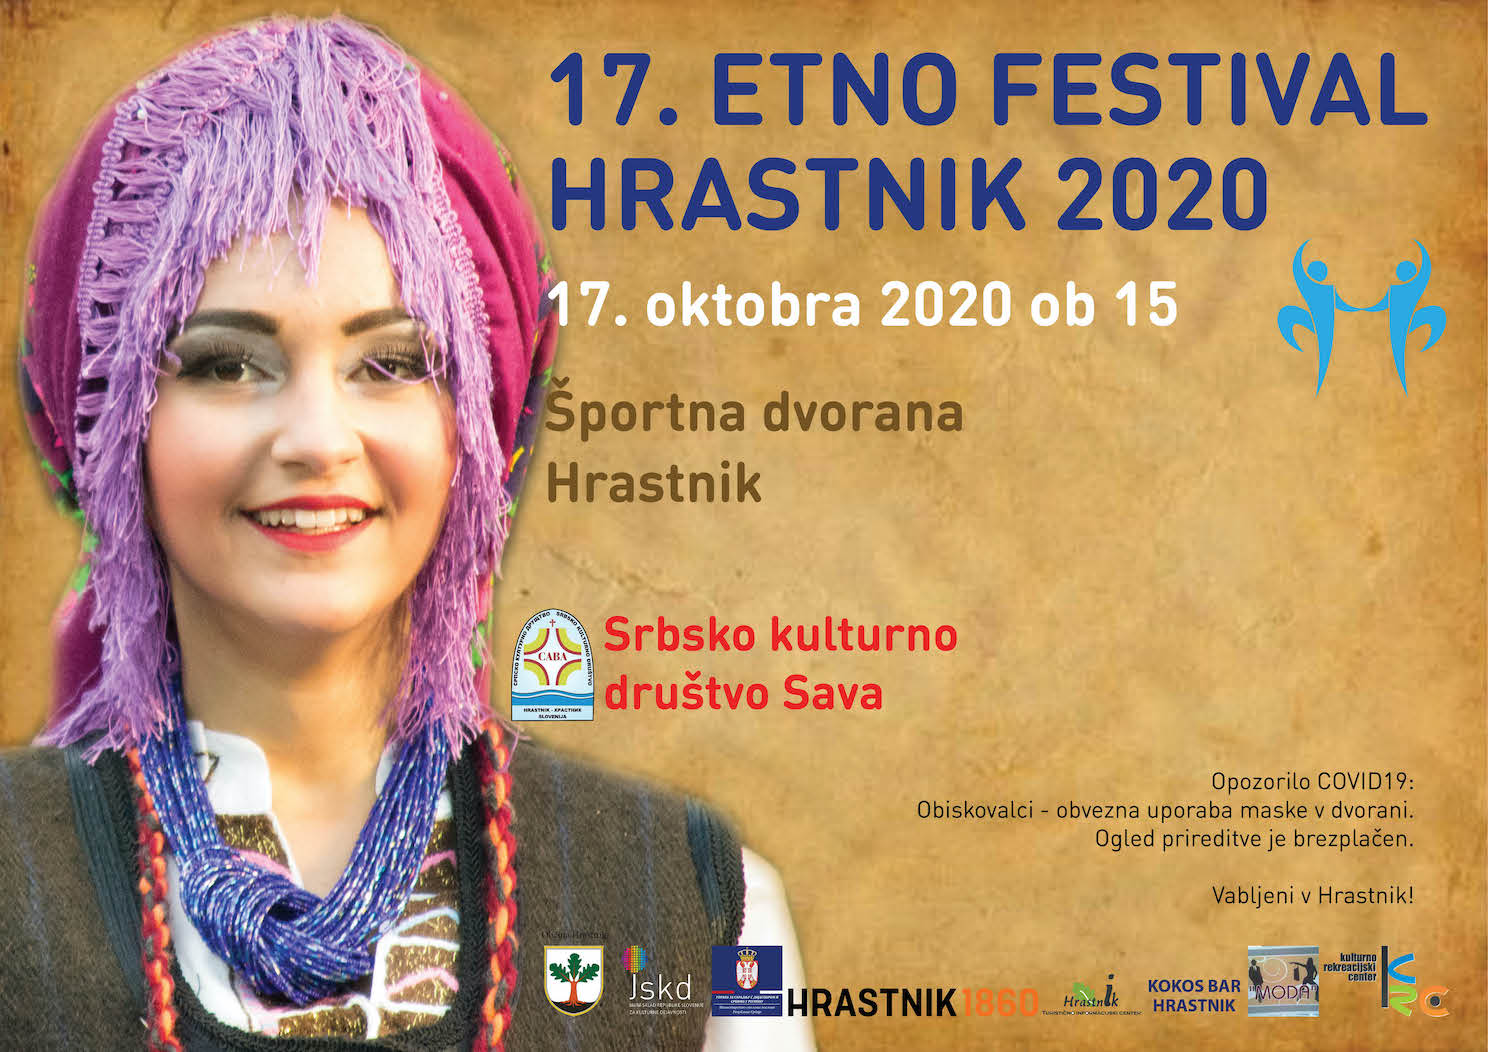 Plakat_Etno festival Hrastnik_2020